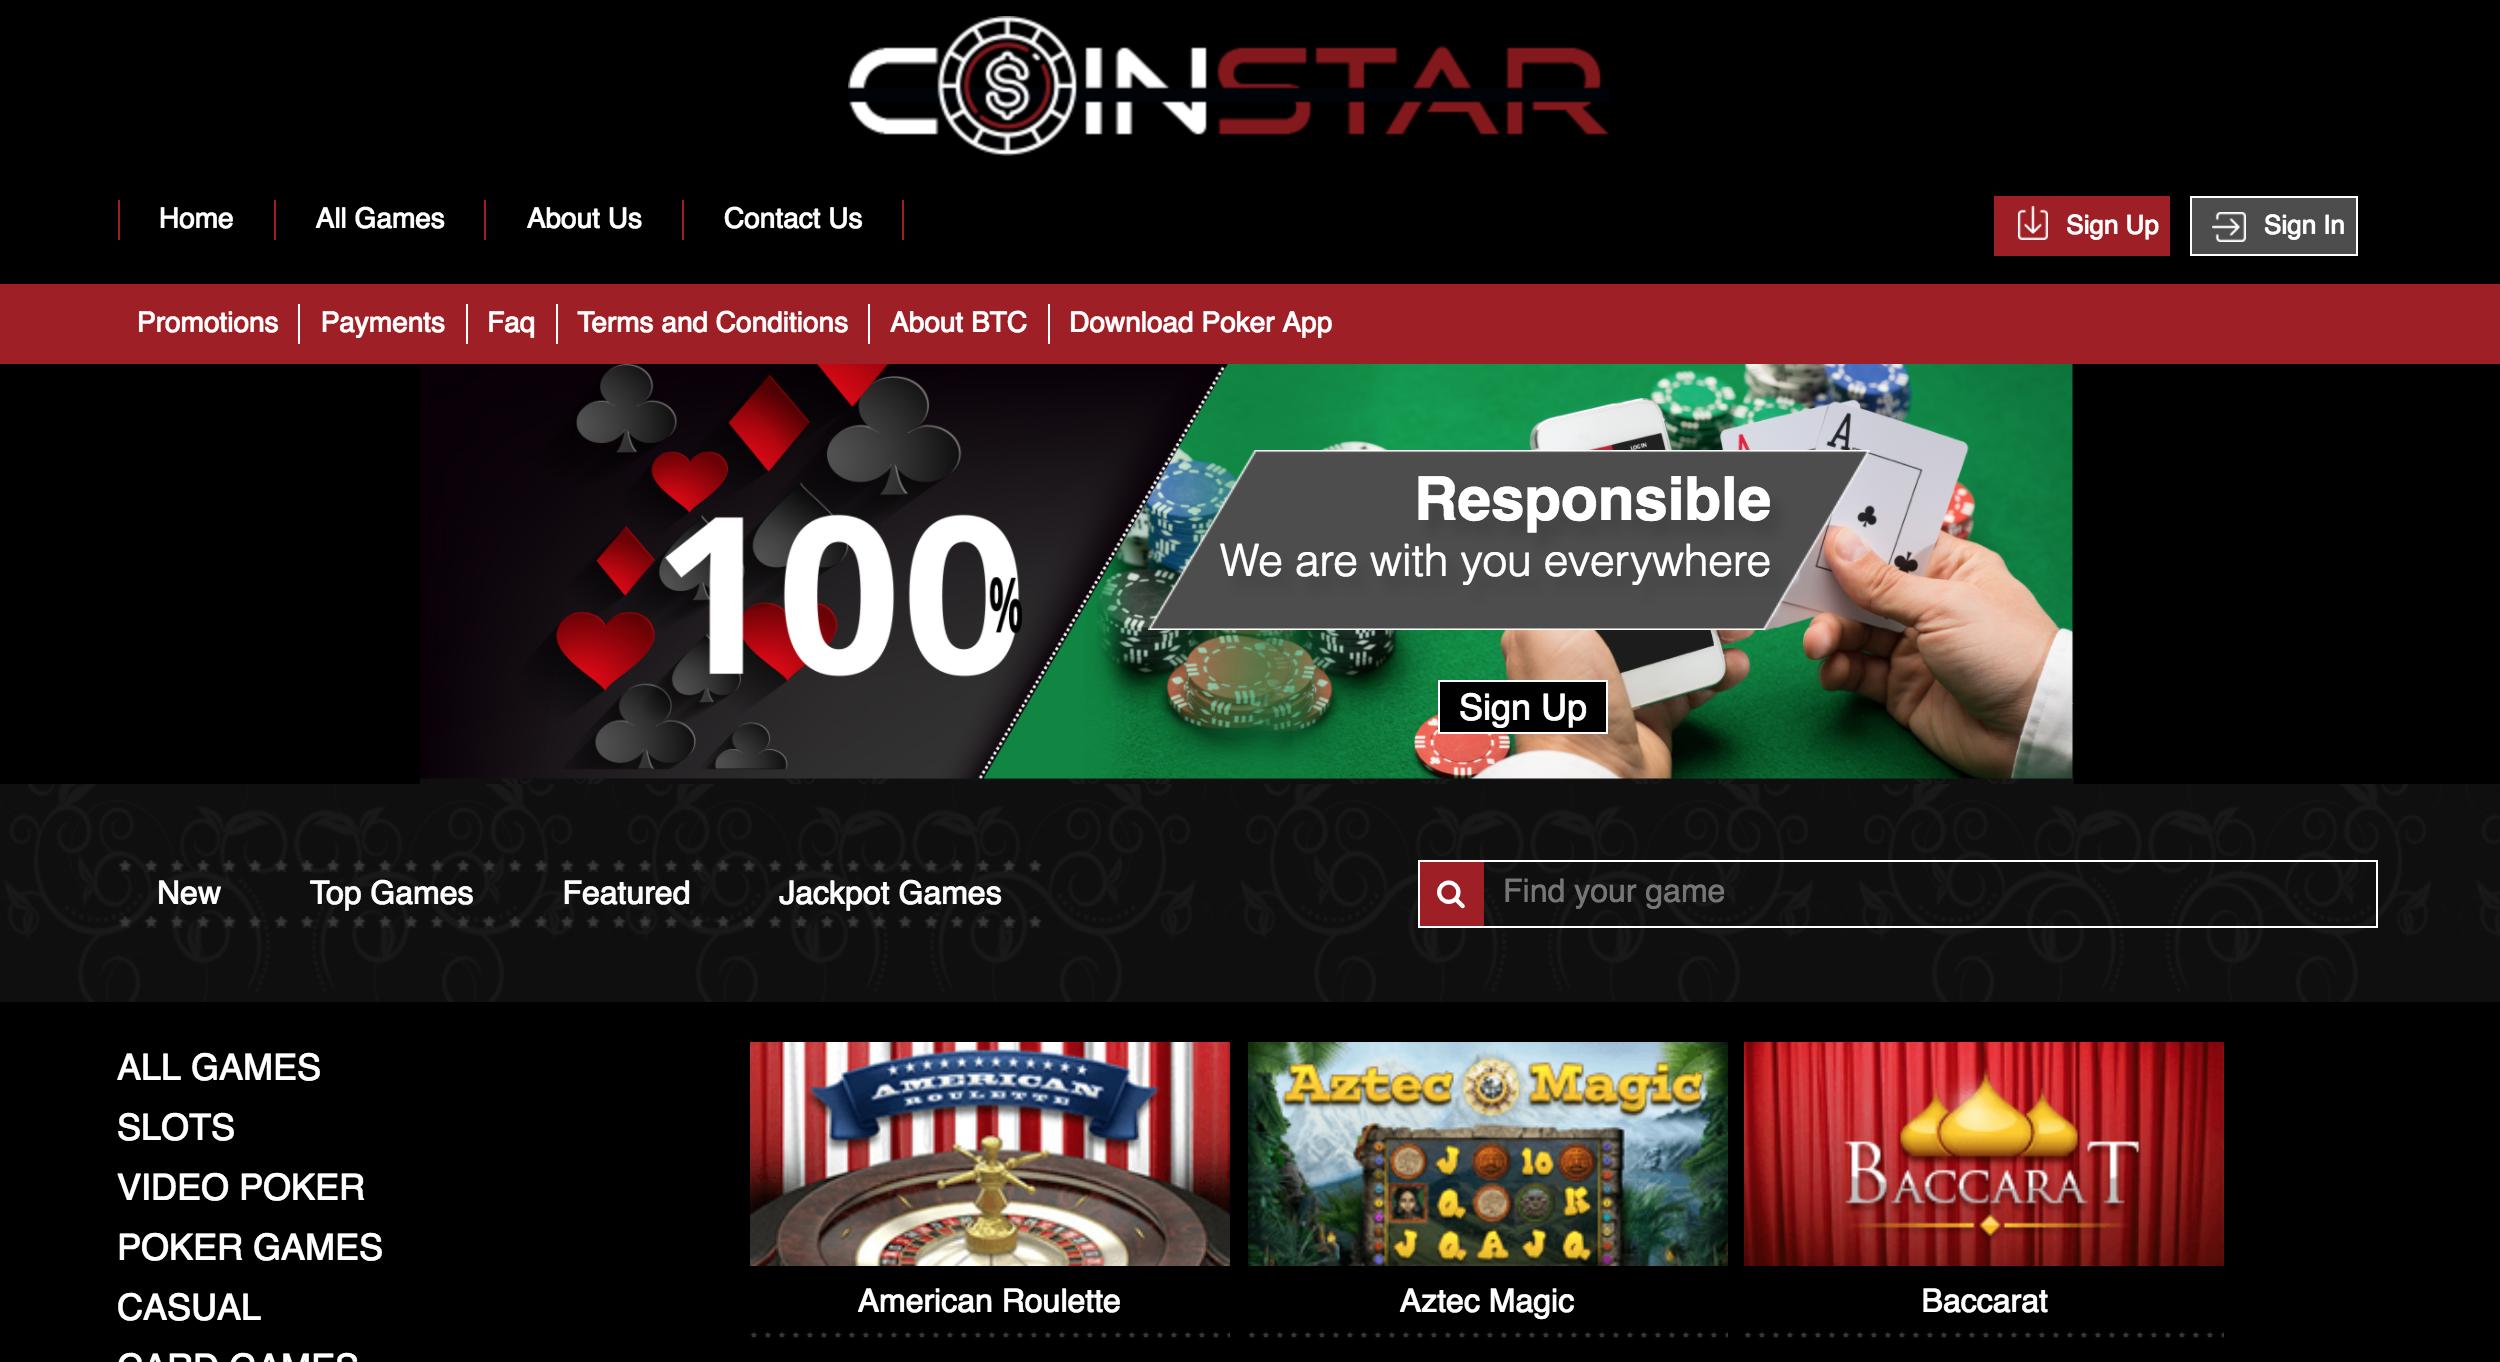 Coinstar.me Homepage